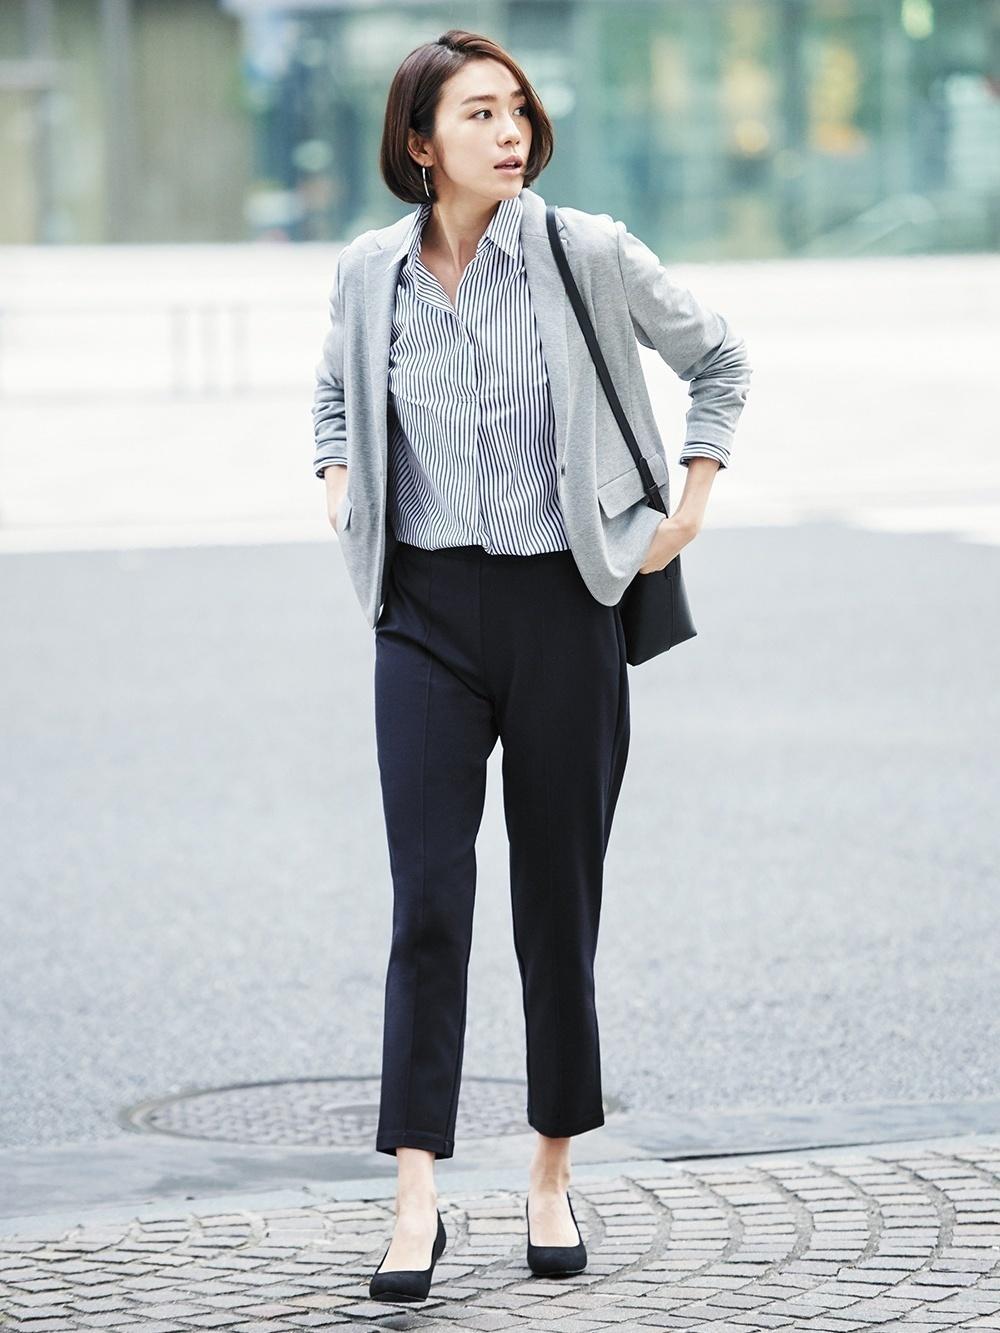 Womens Grey Knit Blazer Navy And White Vertical Striped Dress